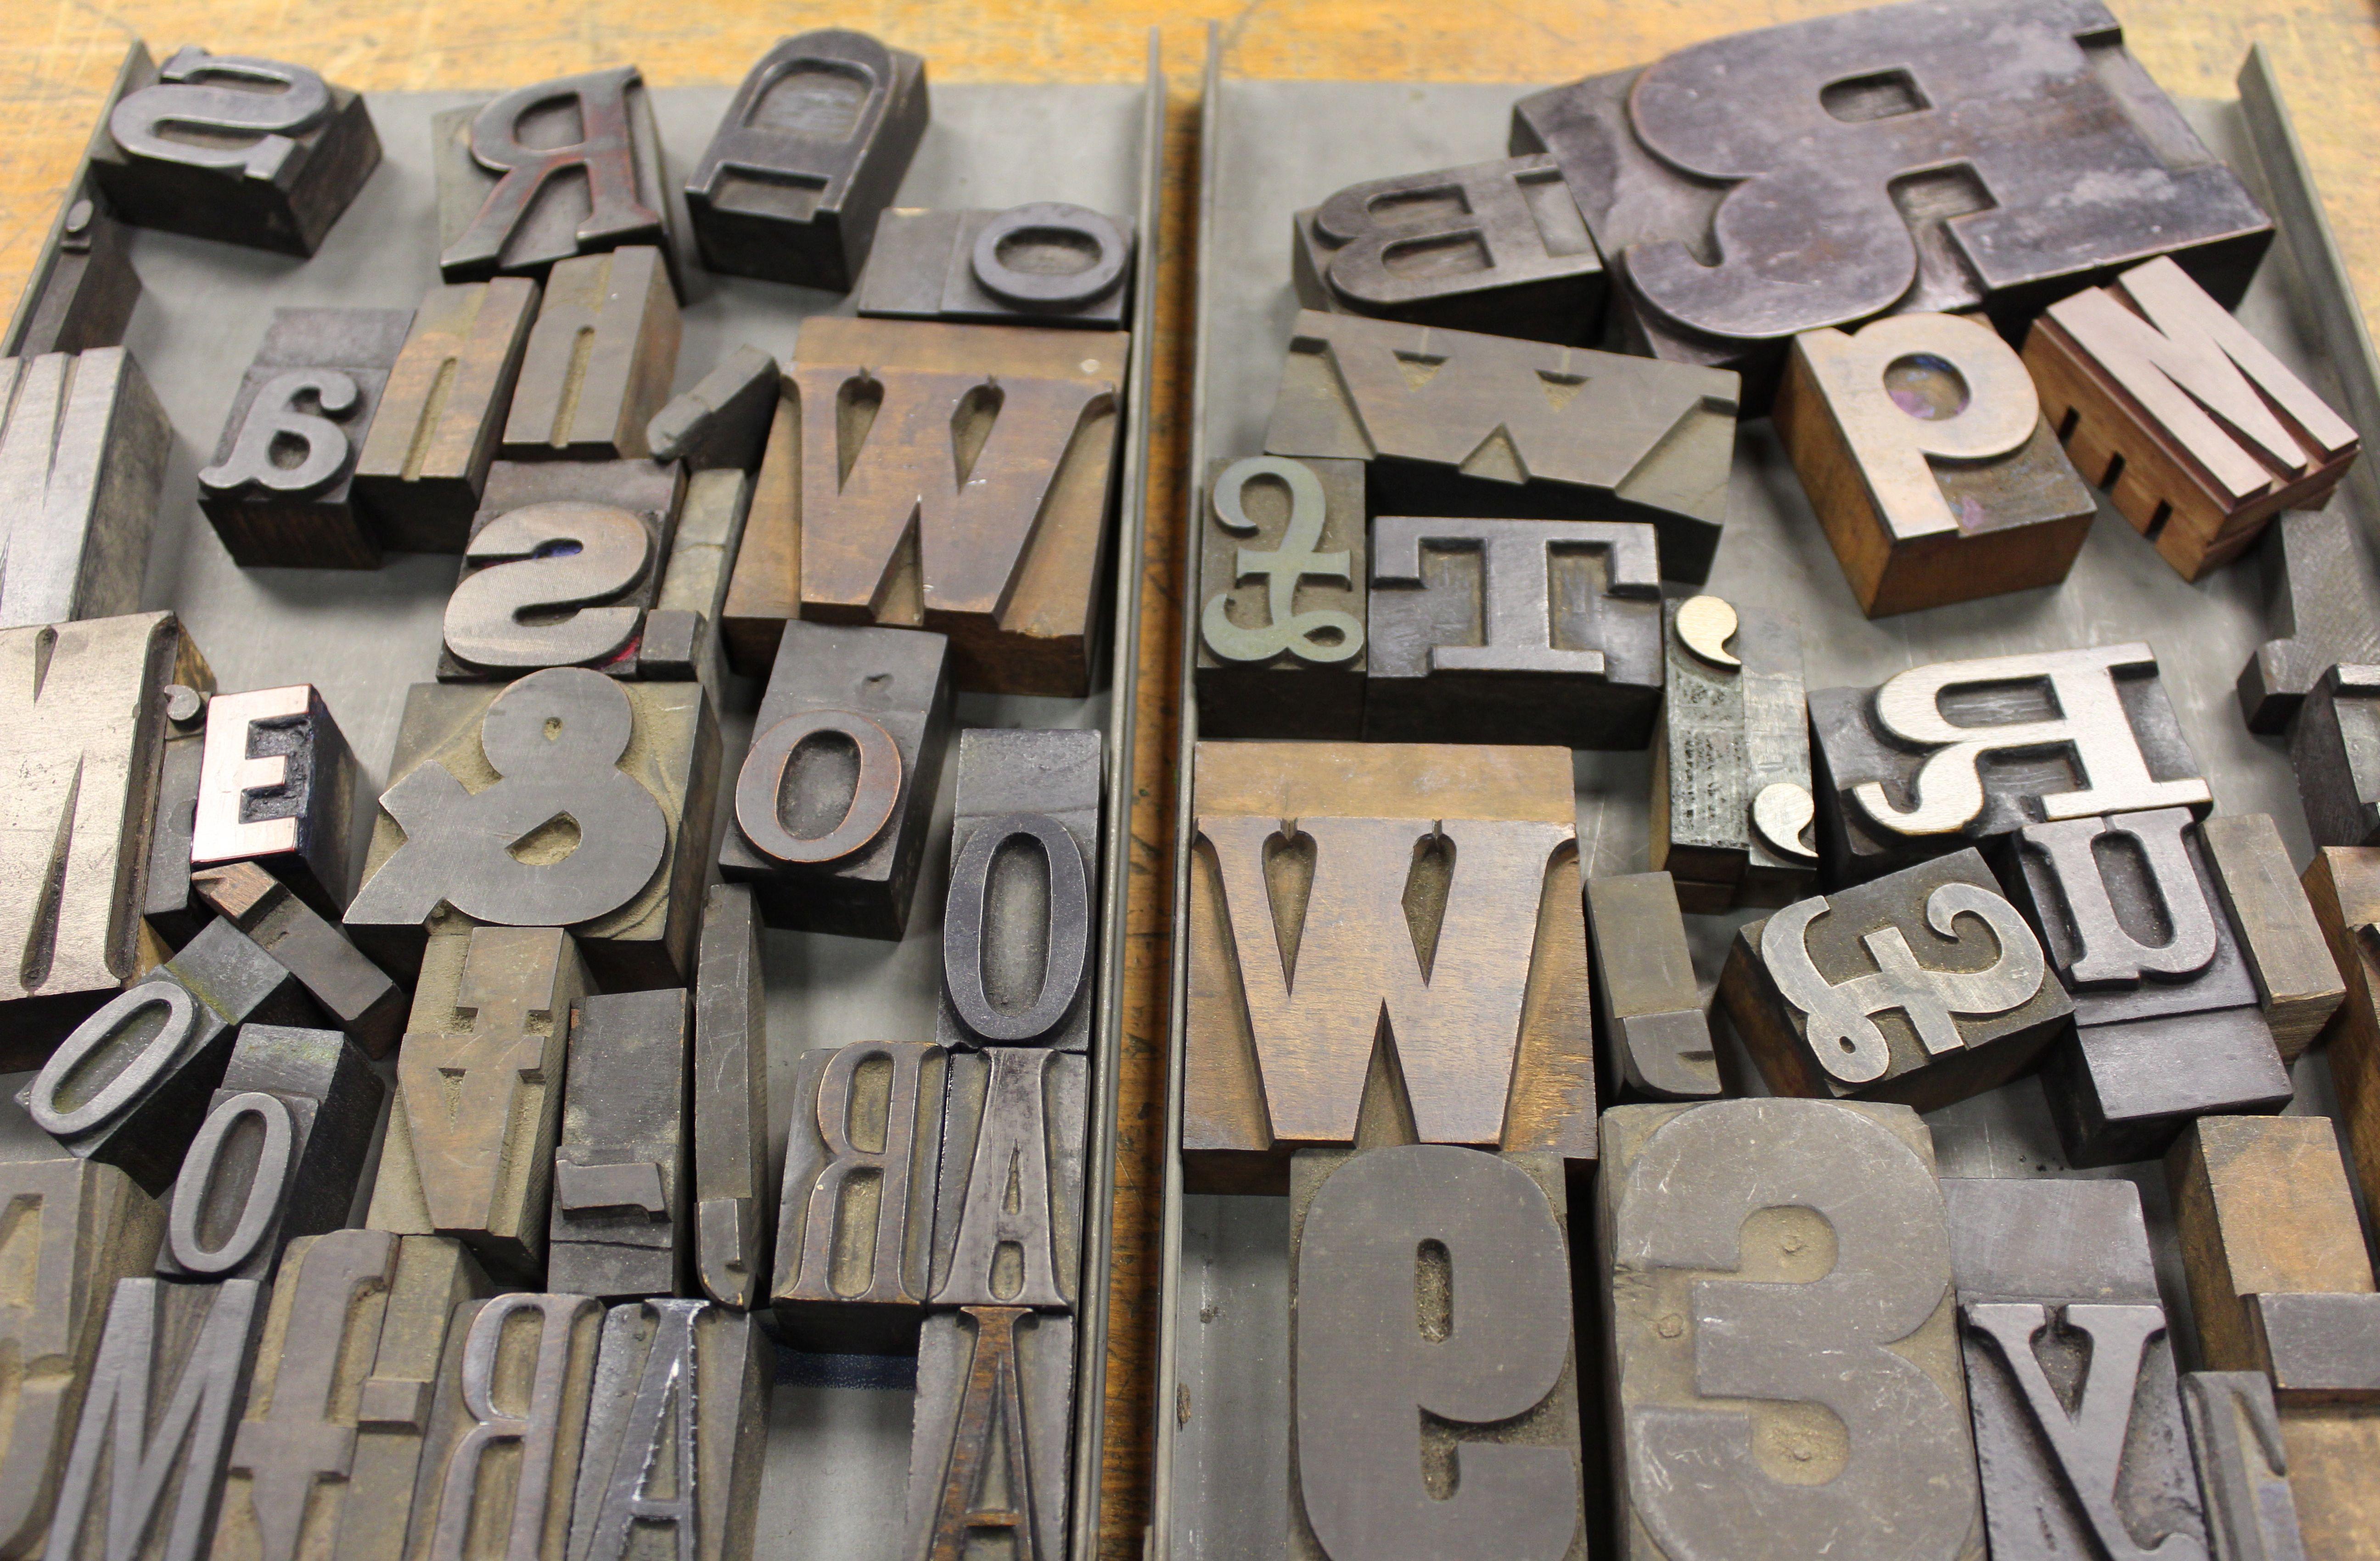 Letterpress, wood engraving